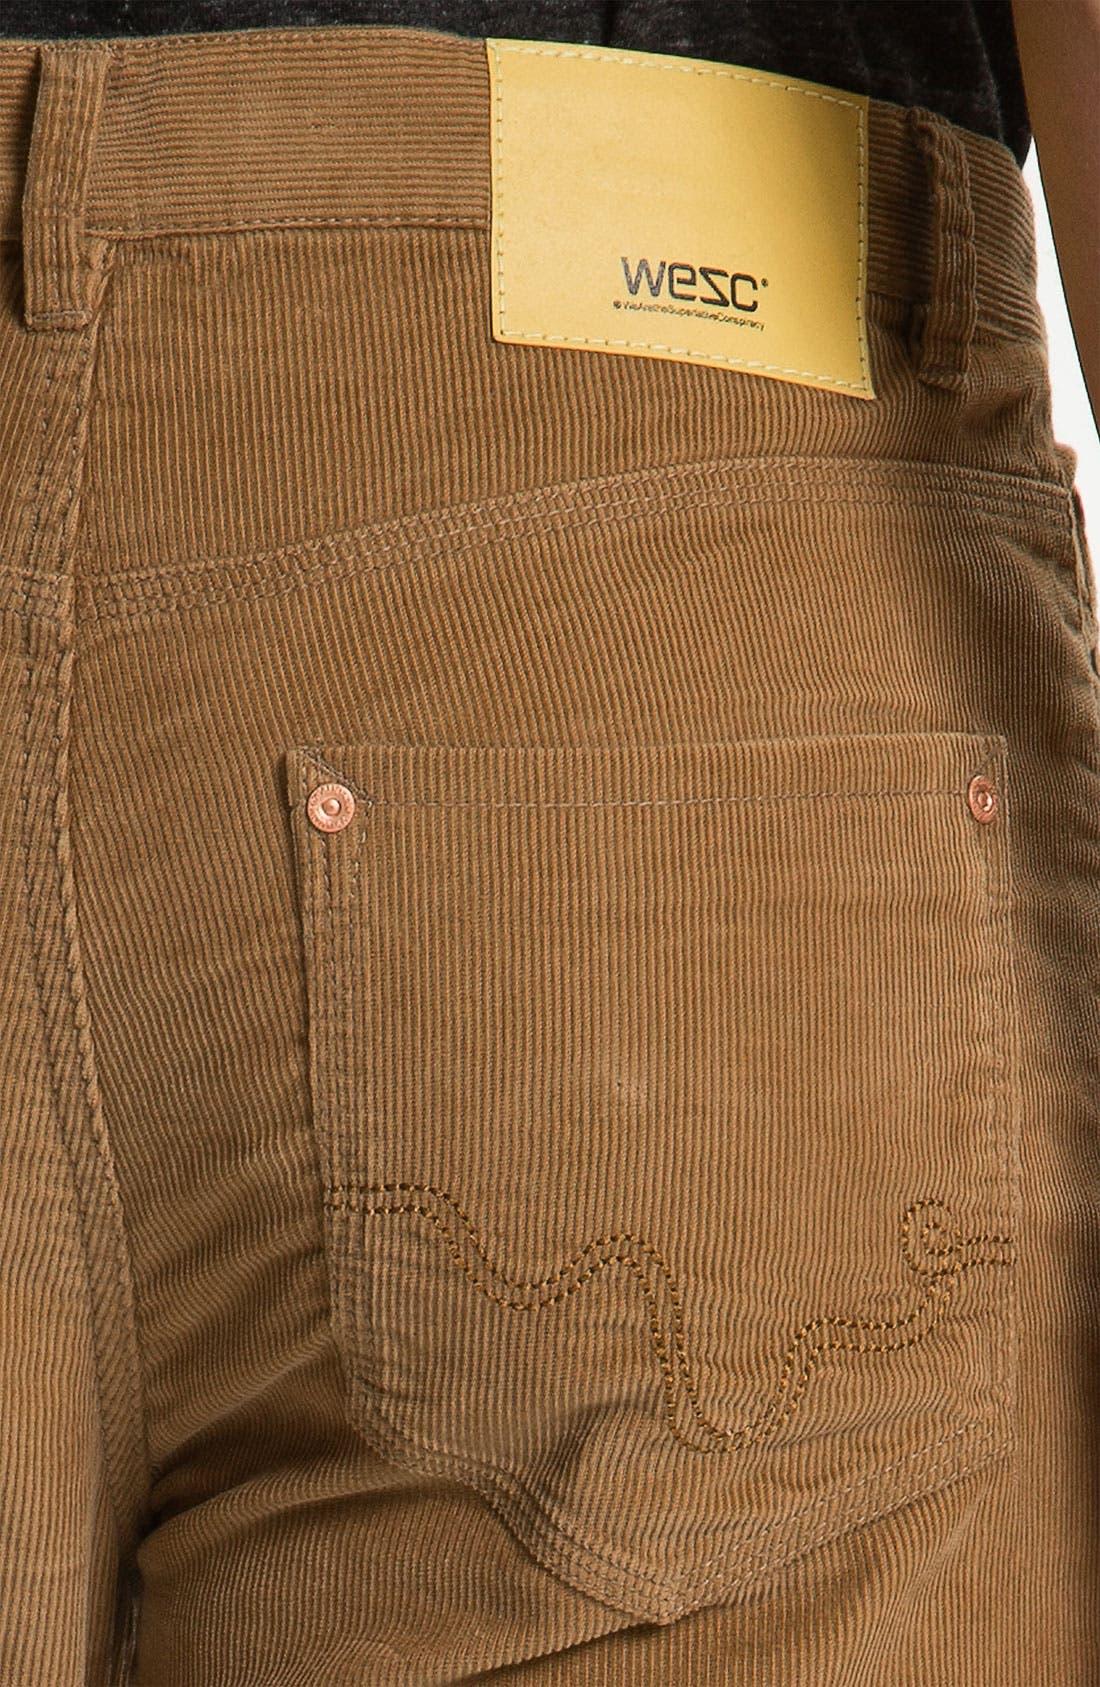 Alternate Image 3  - WeSC 'Eddy' Slim Fit Corduroy Pants